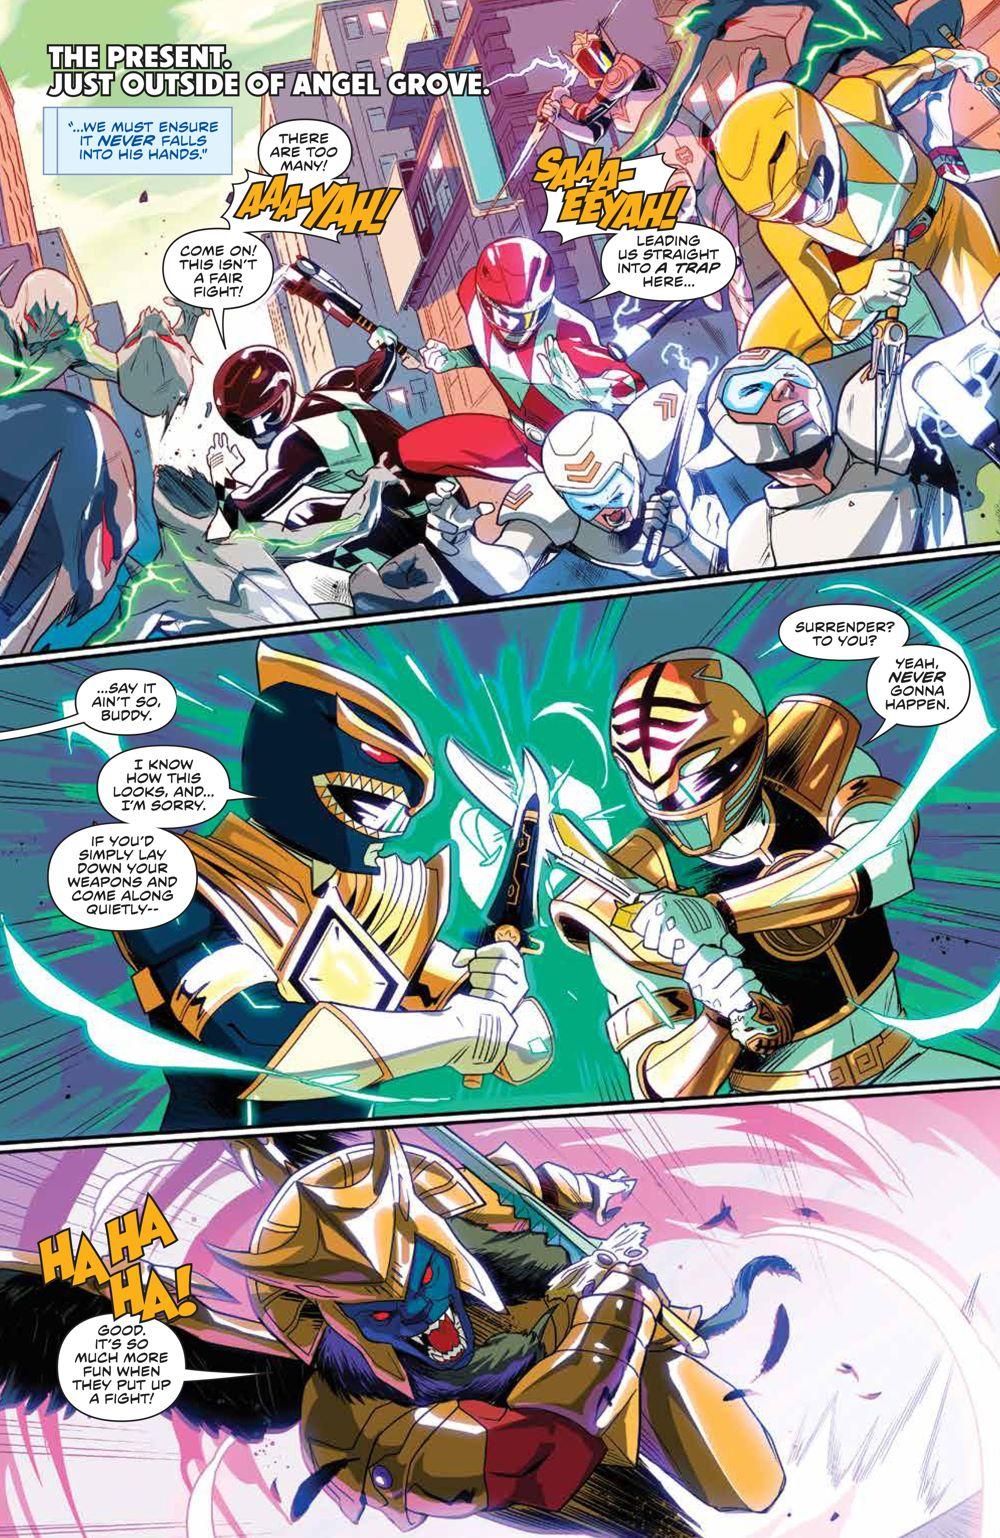 MightyMorphin_007_PRESS_6 ComicList Previews: MIGHTY MORPHIN #7